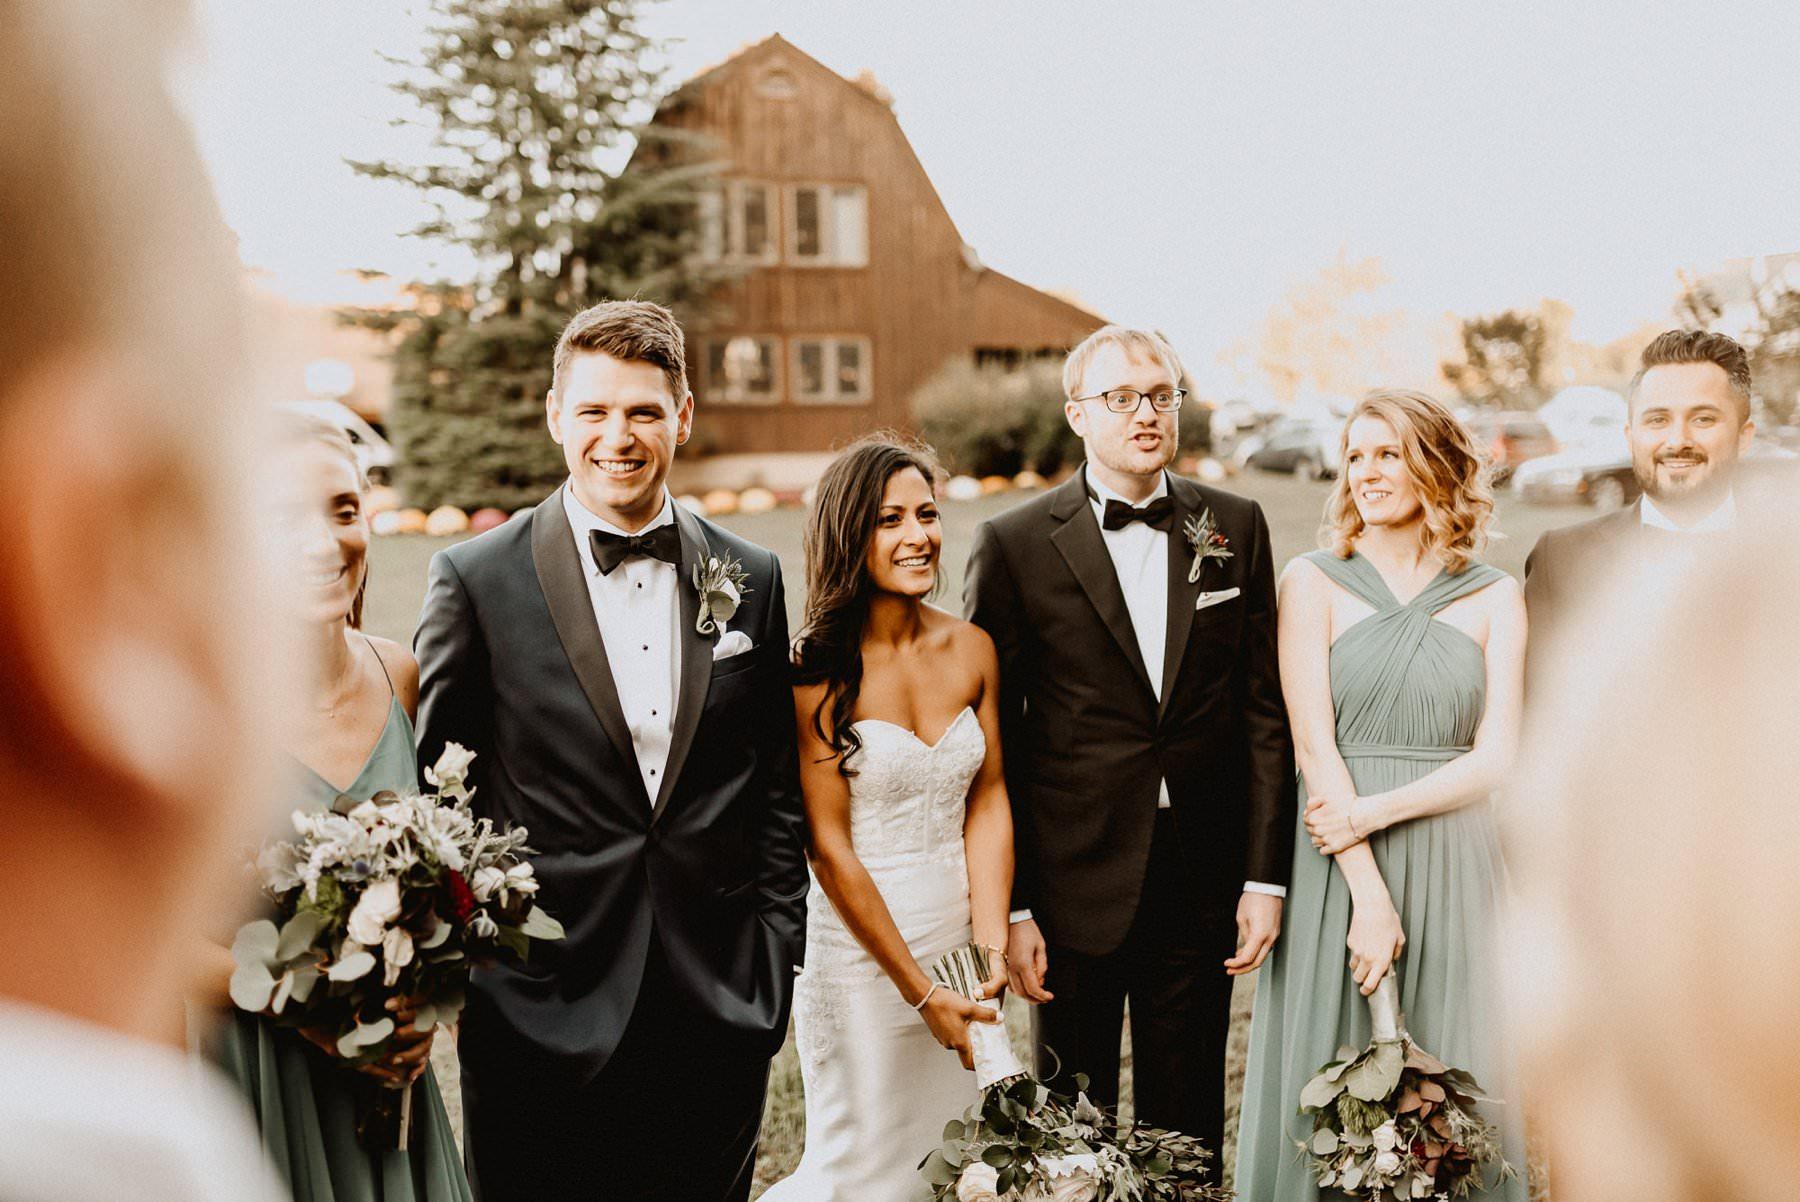 Philadelphia_private_estate_wedding-060.jpg